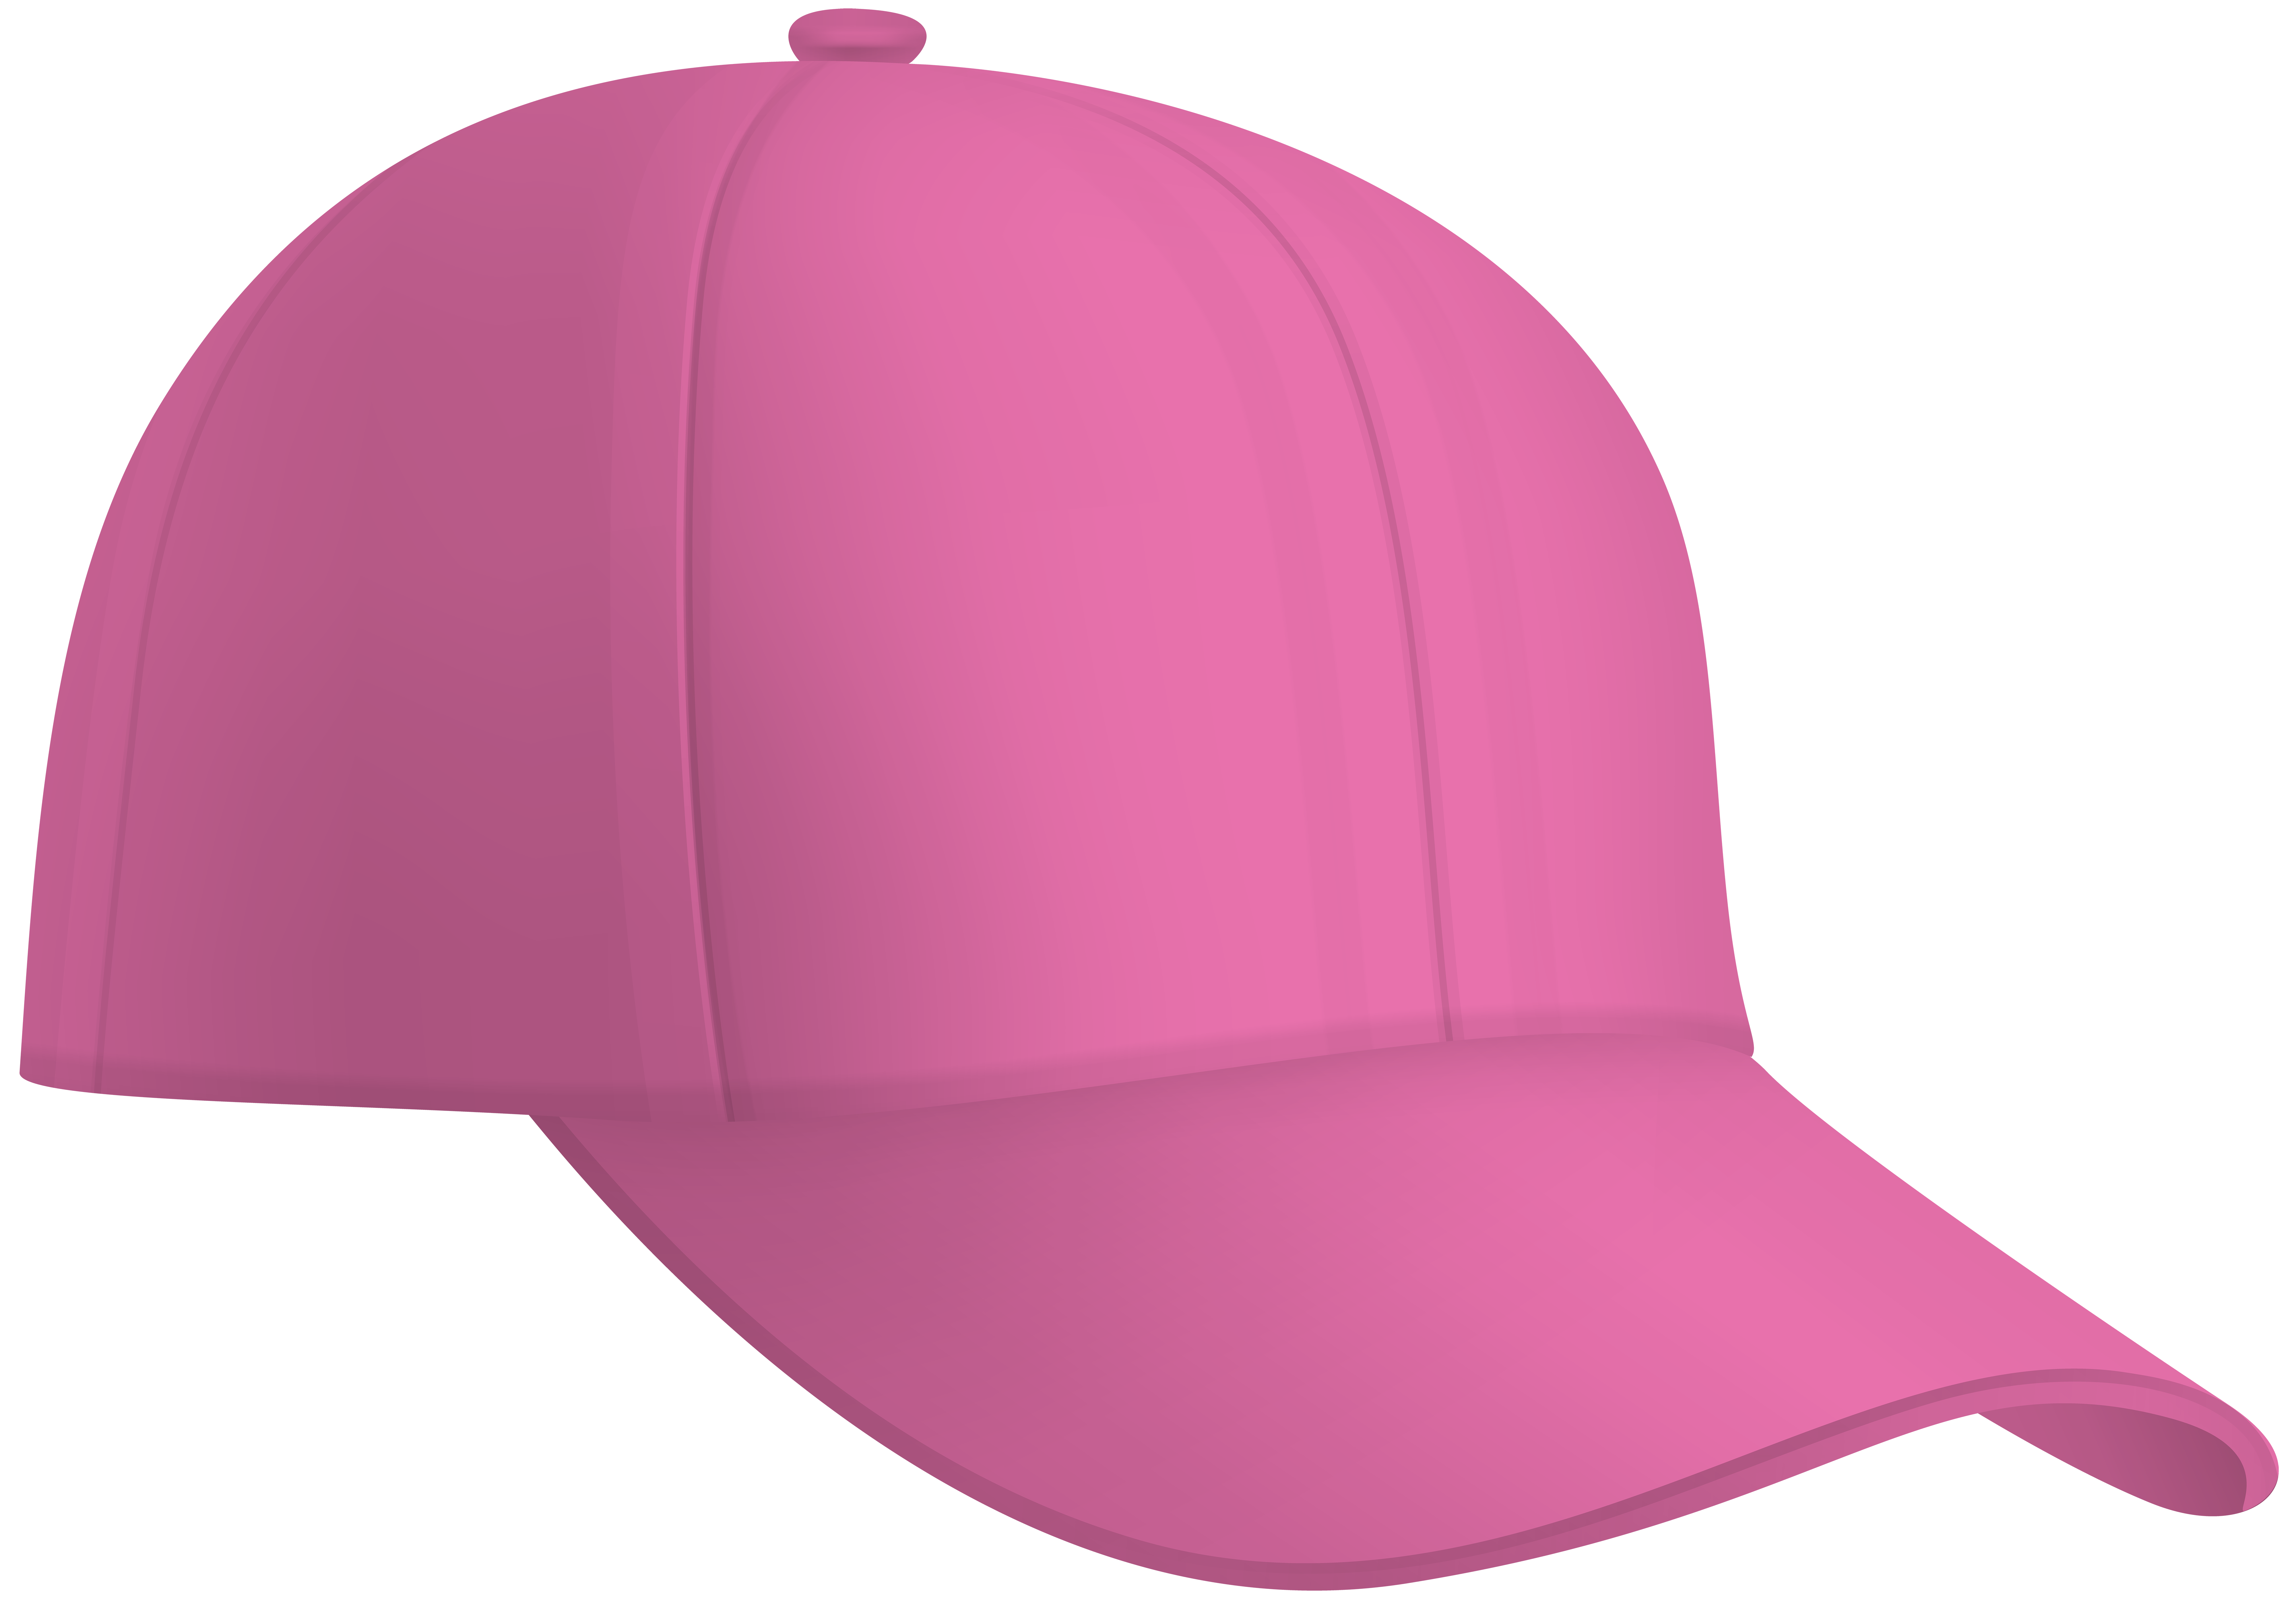 Baseball caps clipart image royalty free stock Baseball Cap Pink PNG Clip Art Image | Gallery Yopriceville - High ... image royalty free stock